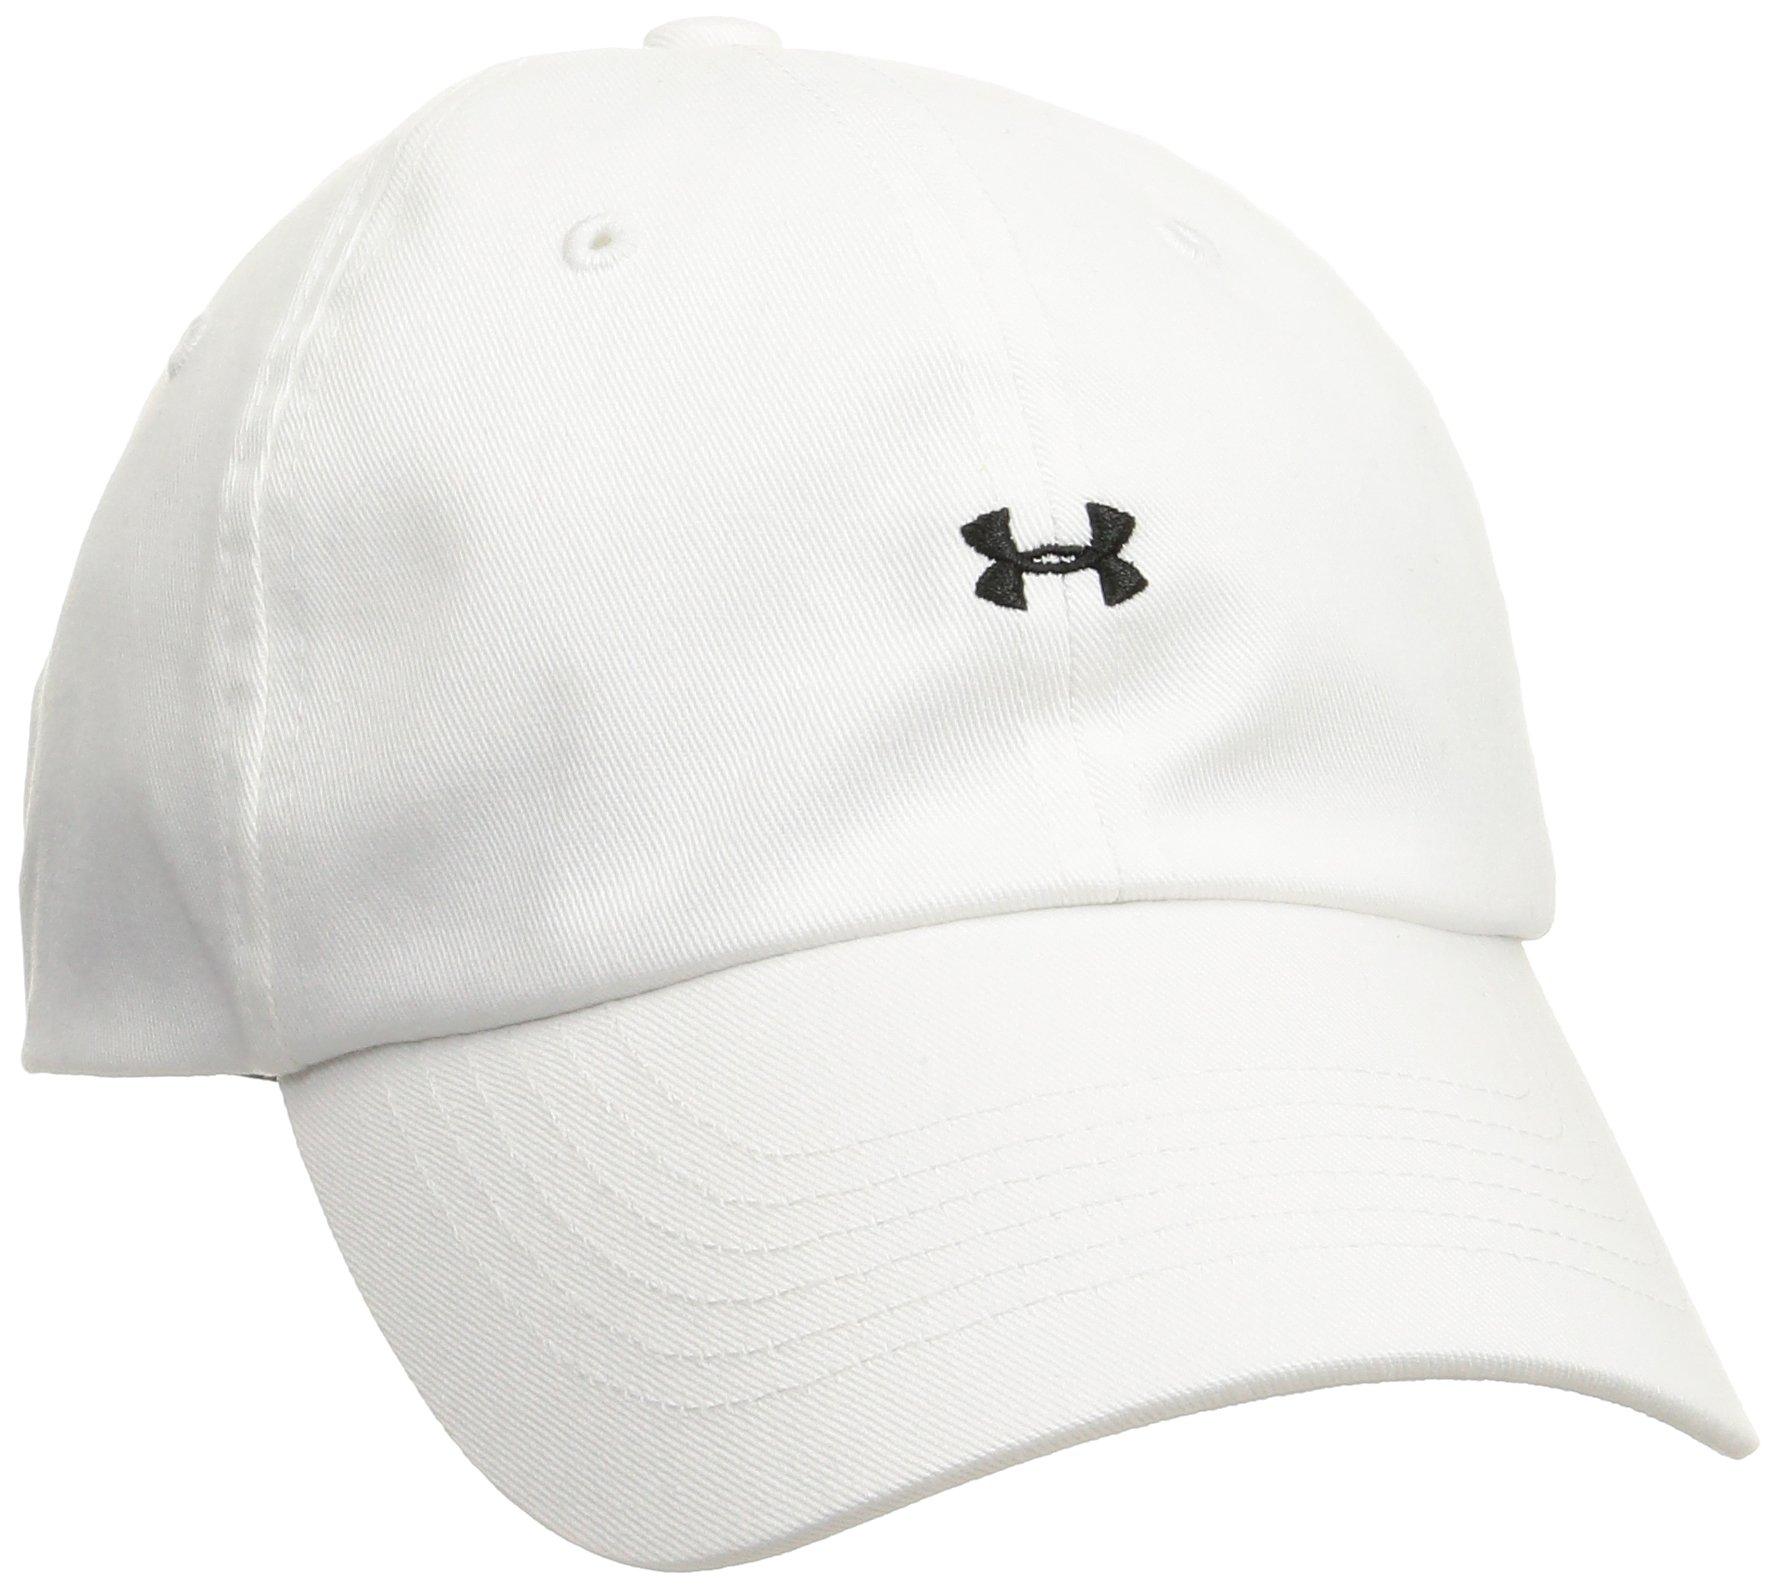 Under Armour Womens Favorite Logo Cap, White (100)/Black, One Size